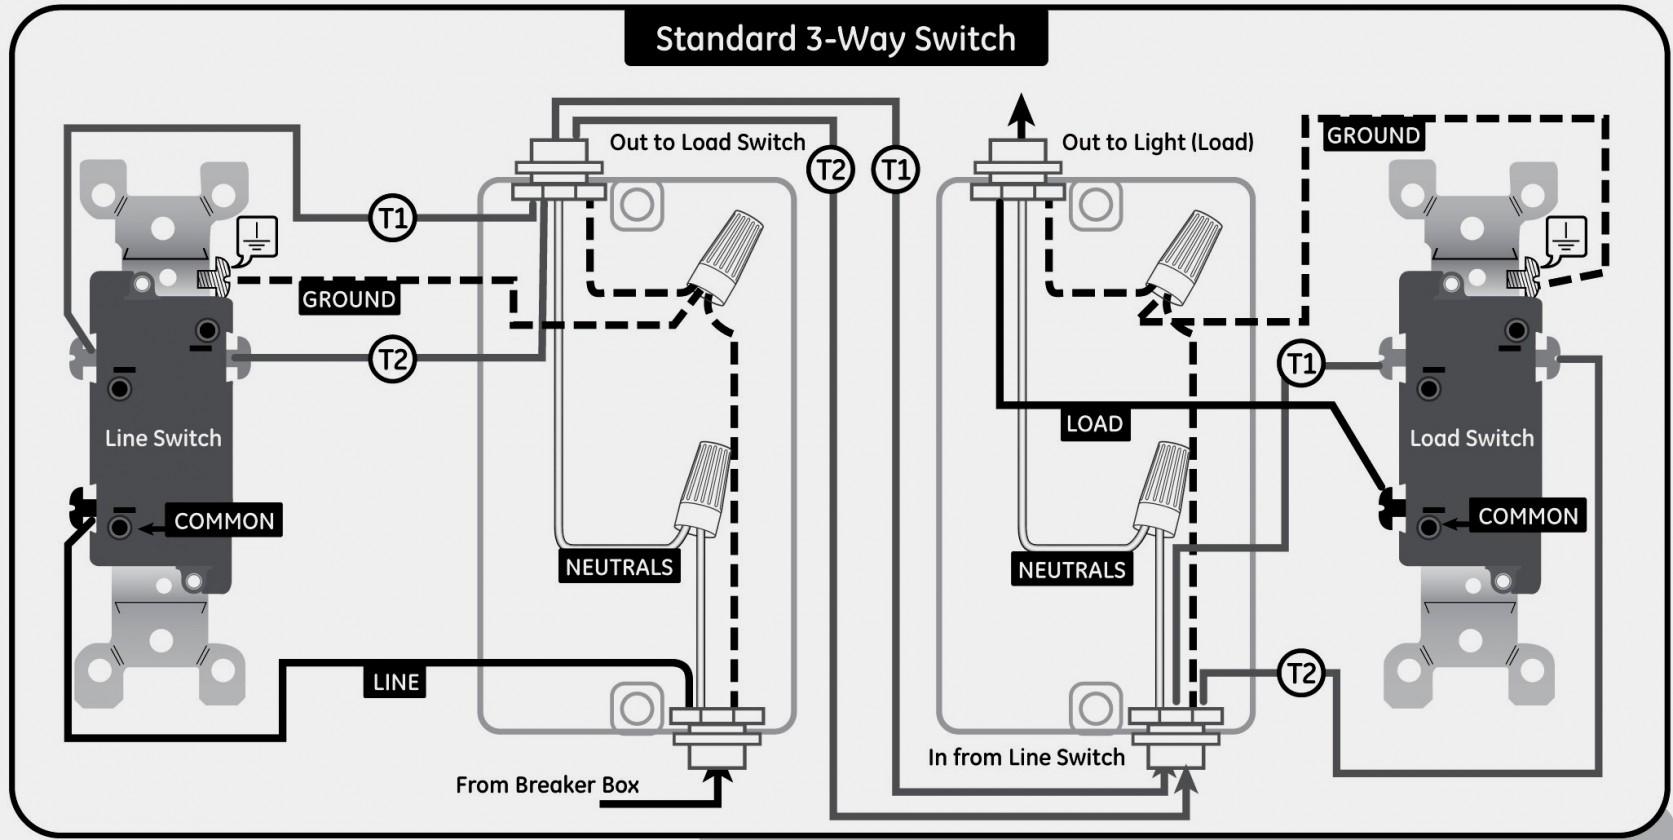 Z Wave Three Way Switch Wiring Diagram | Wiring Diagram - Ge Z Wave 3 Way Switch Wiring Diagram